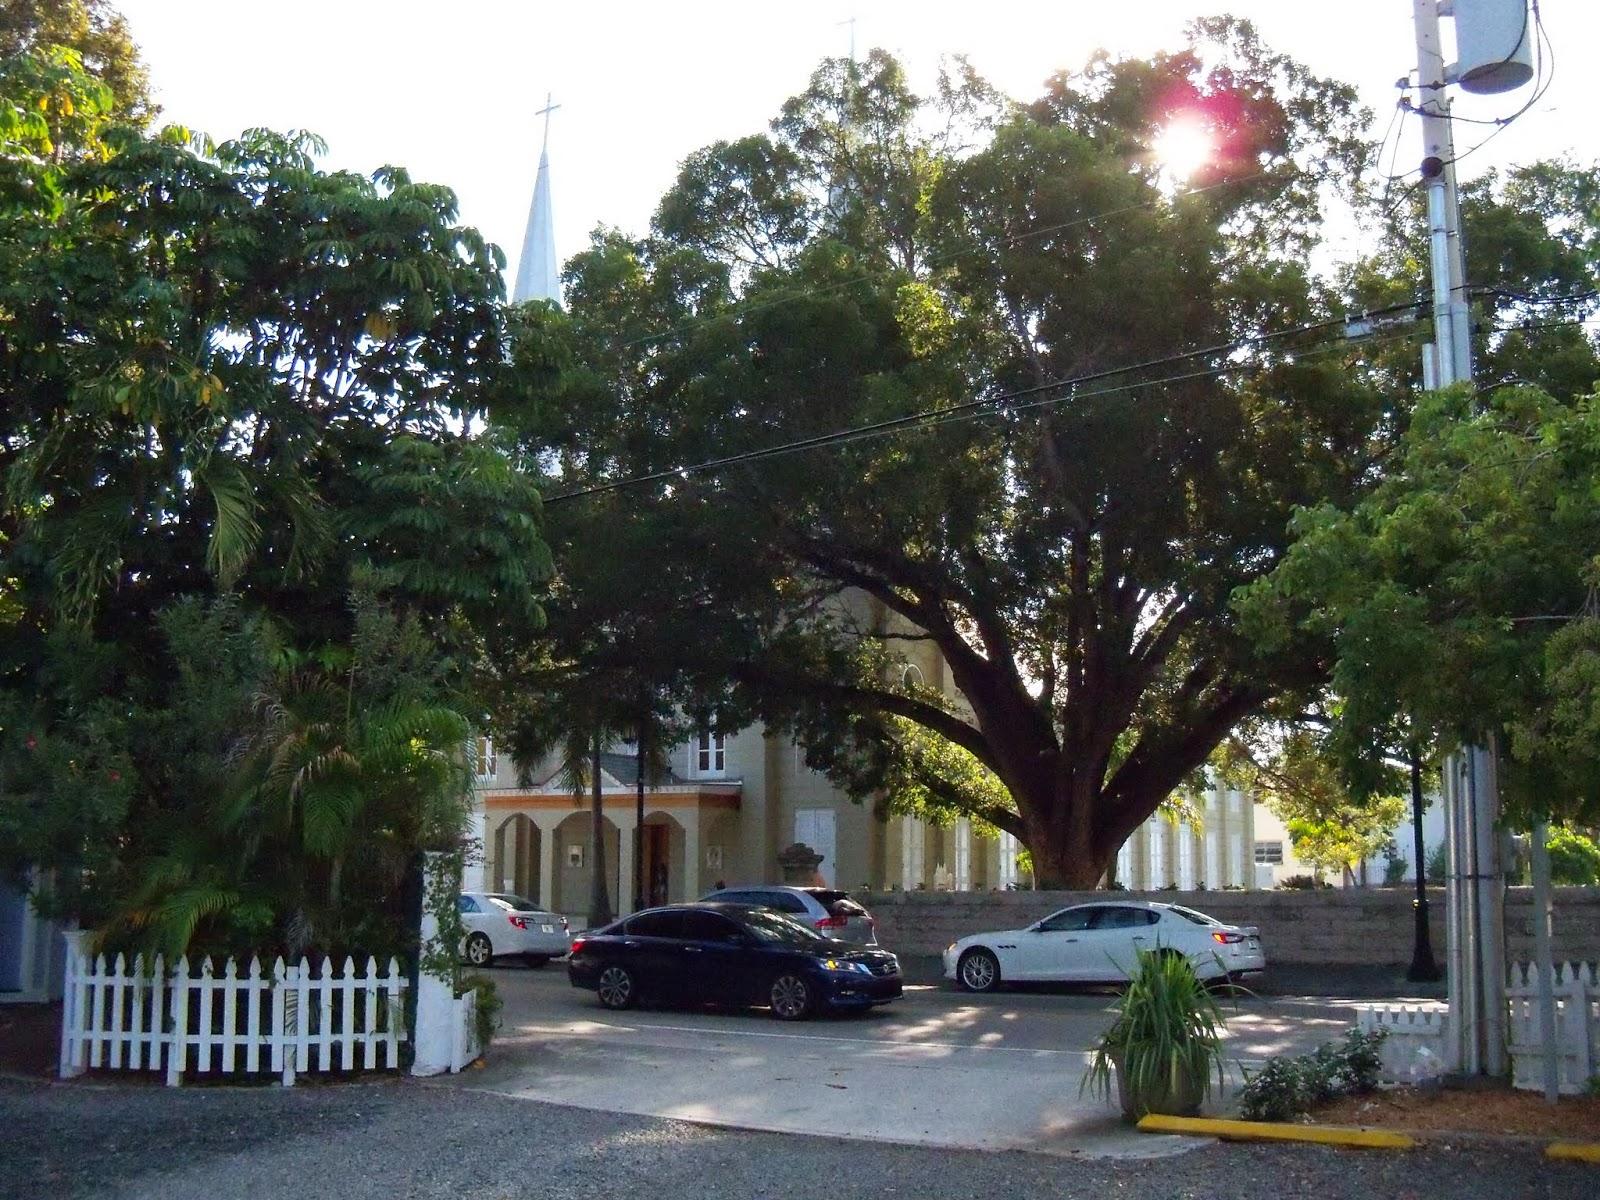 Key West Vacation - 116_5376.JPG